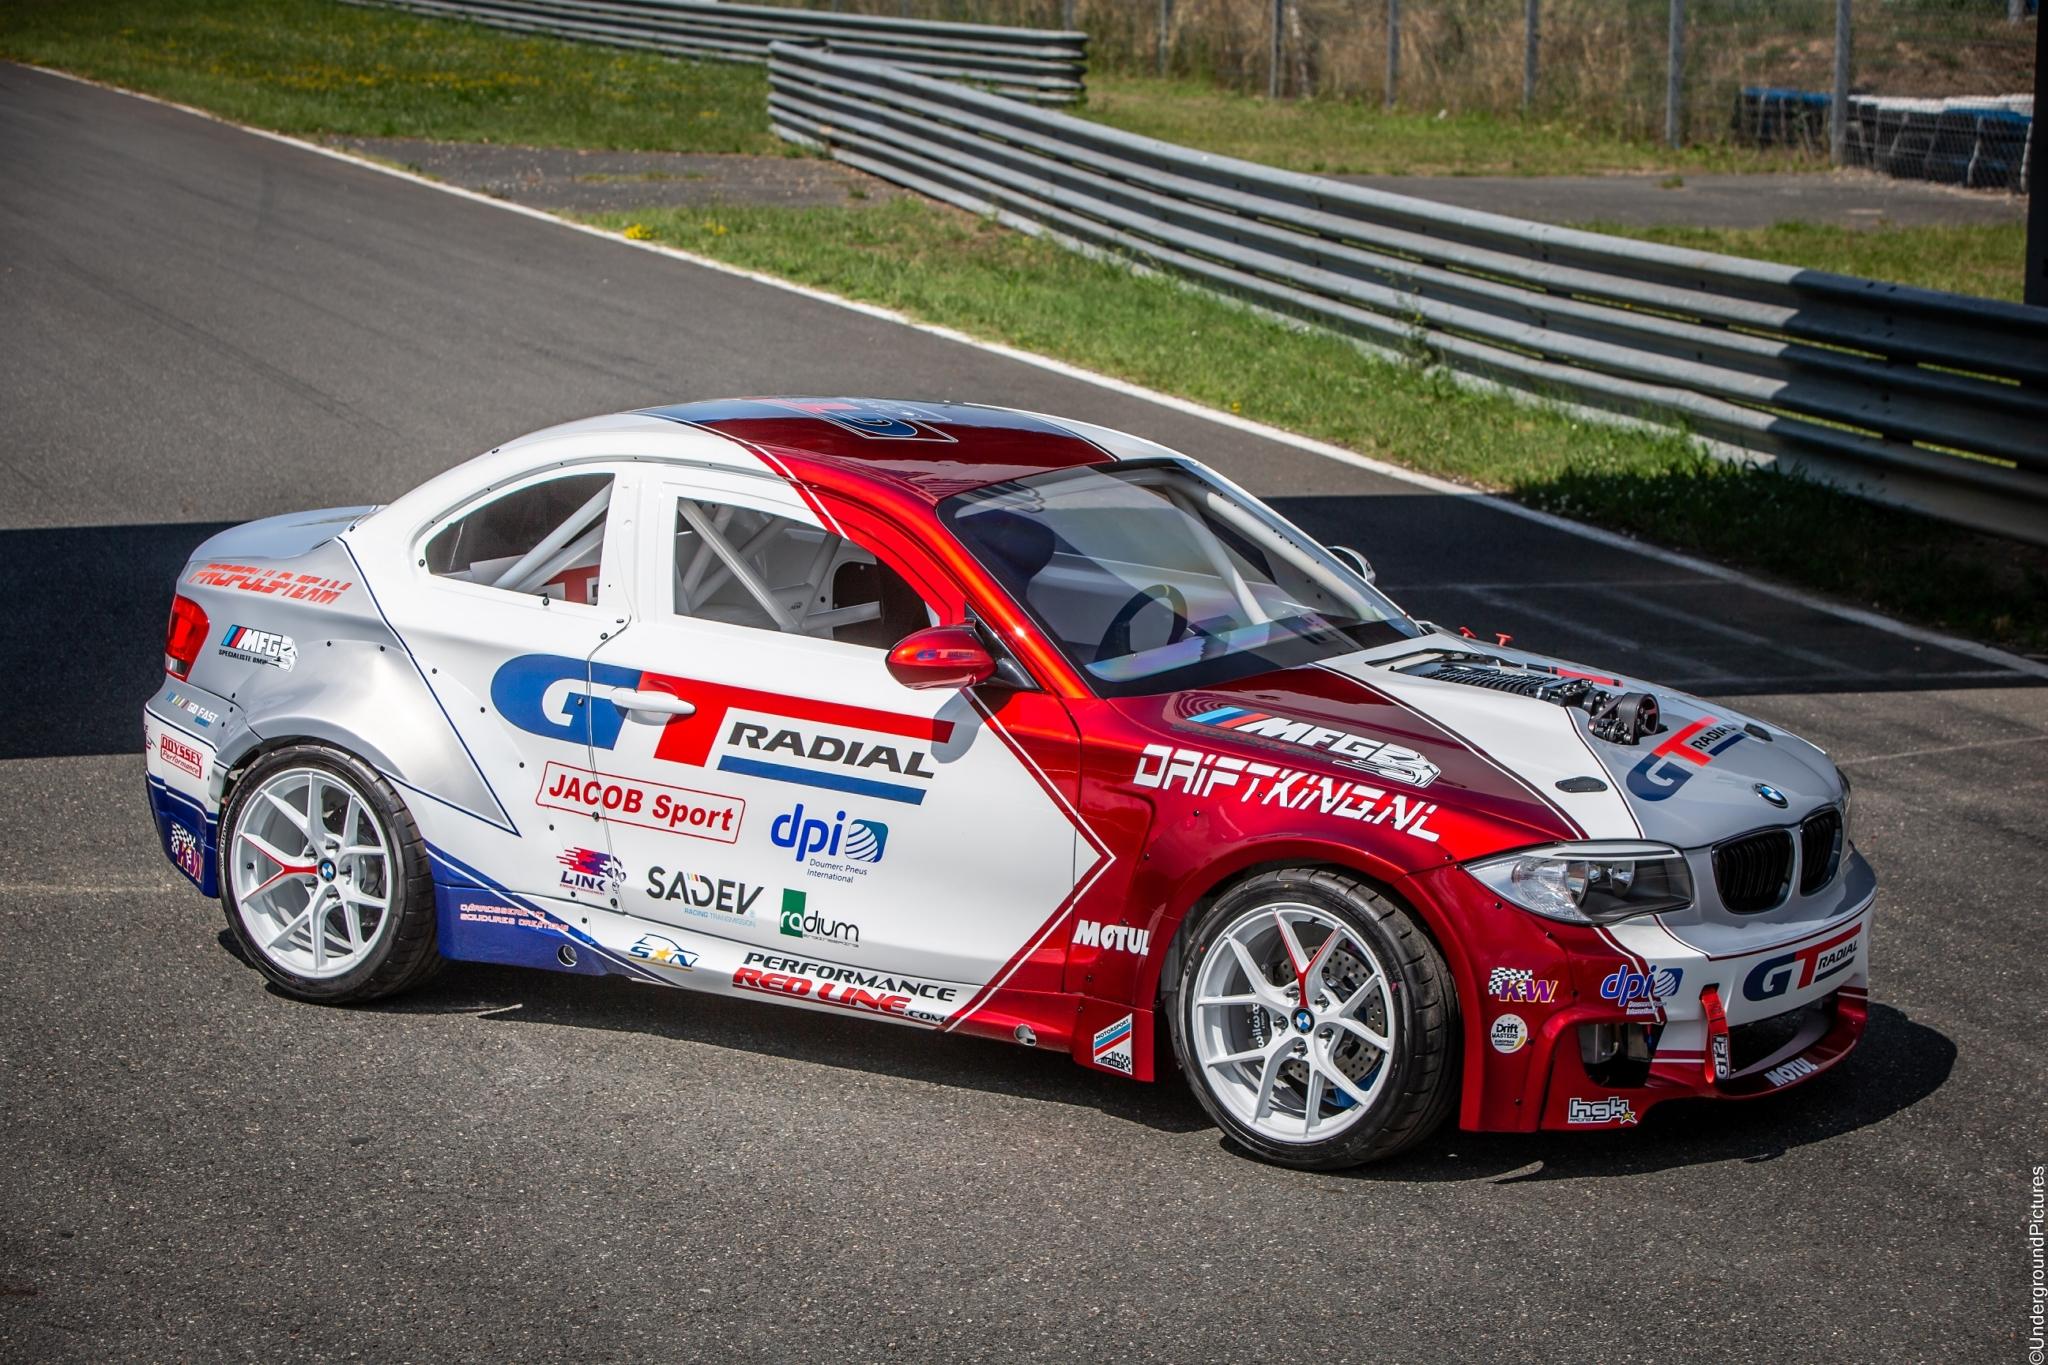 GT Radial-sponsored Boulbes defends Elite French Drift Championship